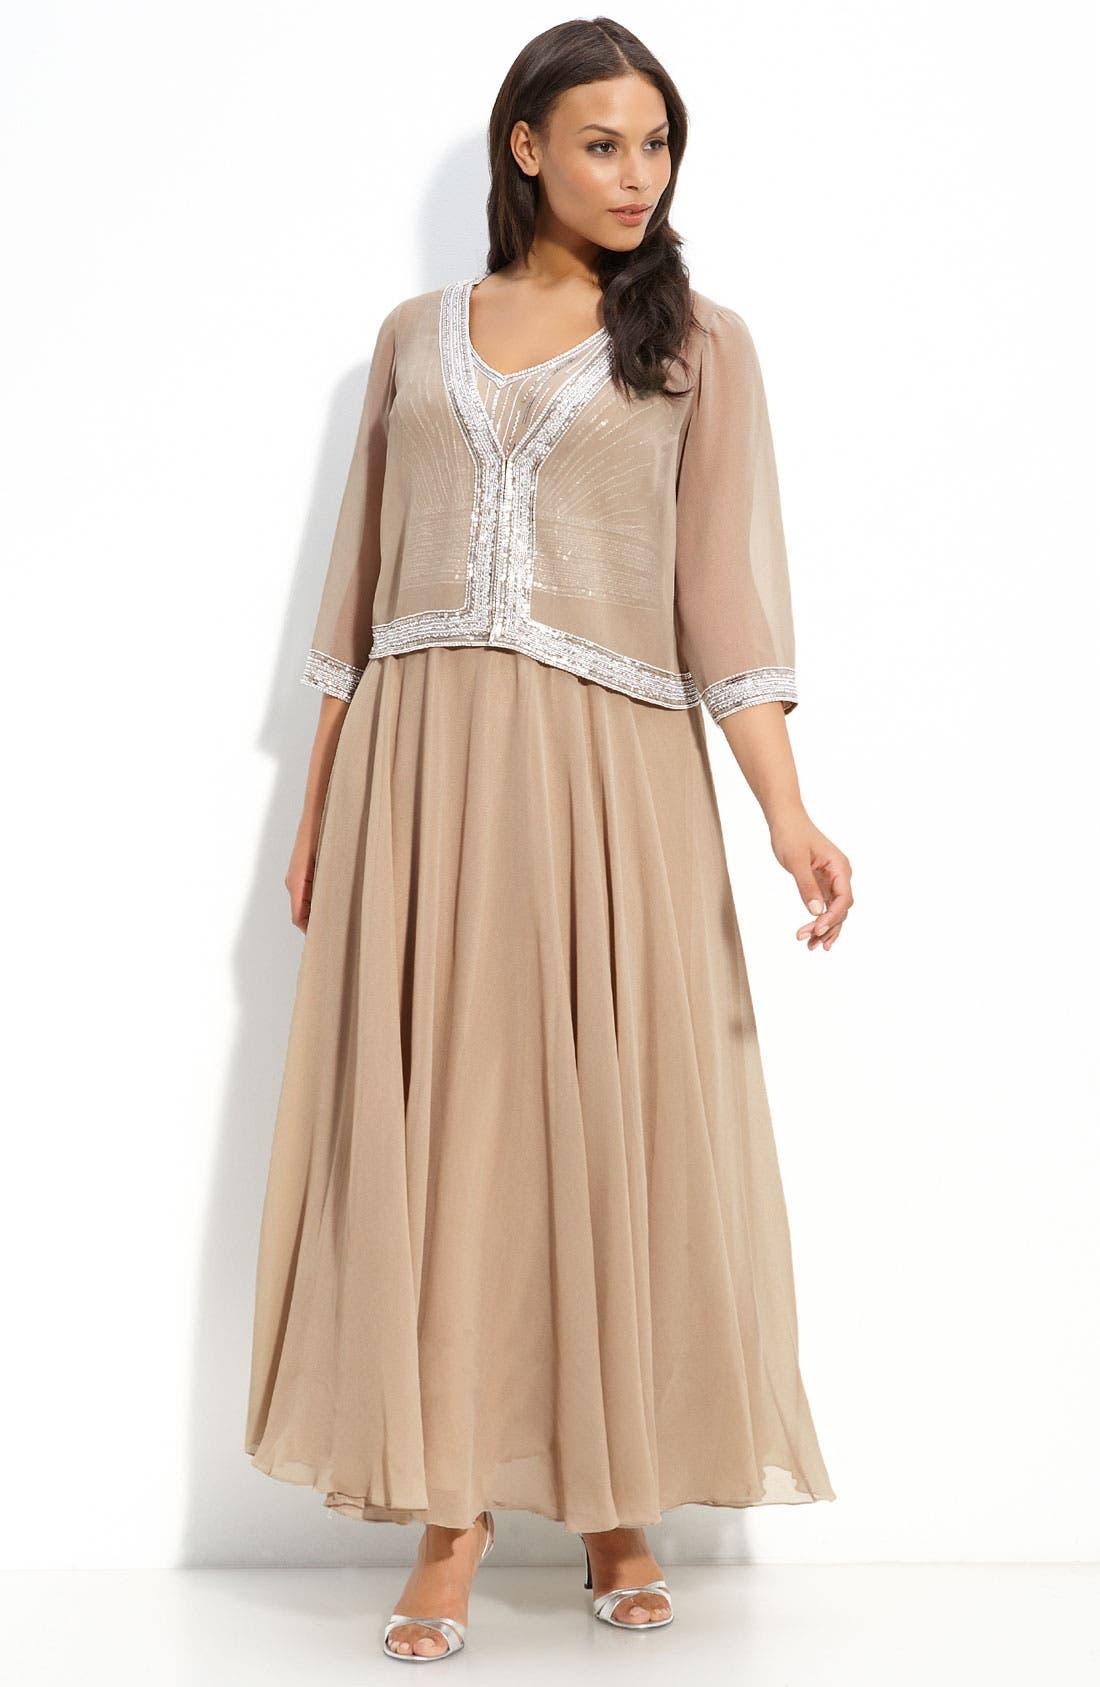 Alternate Image 1 Selected - J Kara Sequin Gown & Jacket (Plus Size)